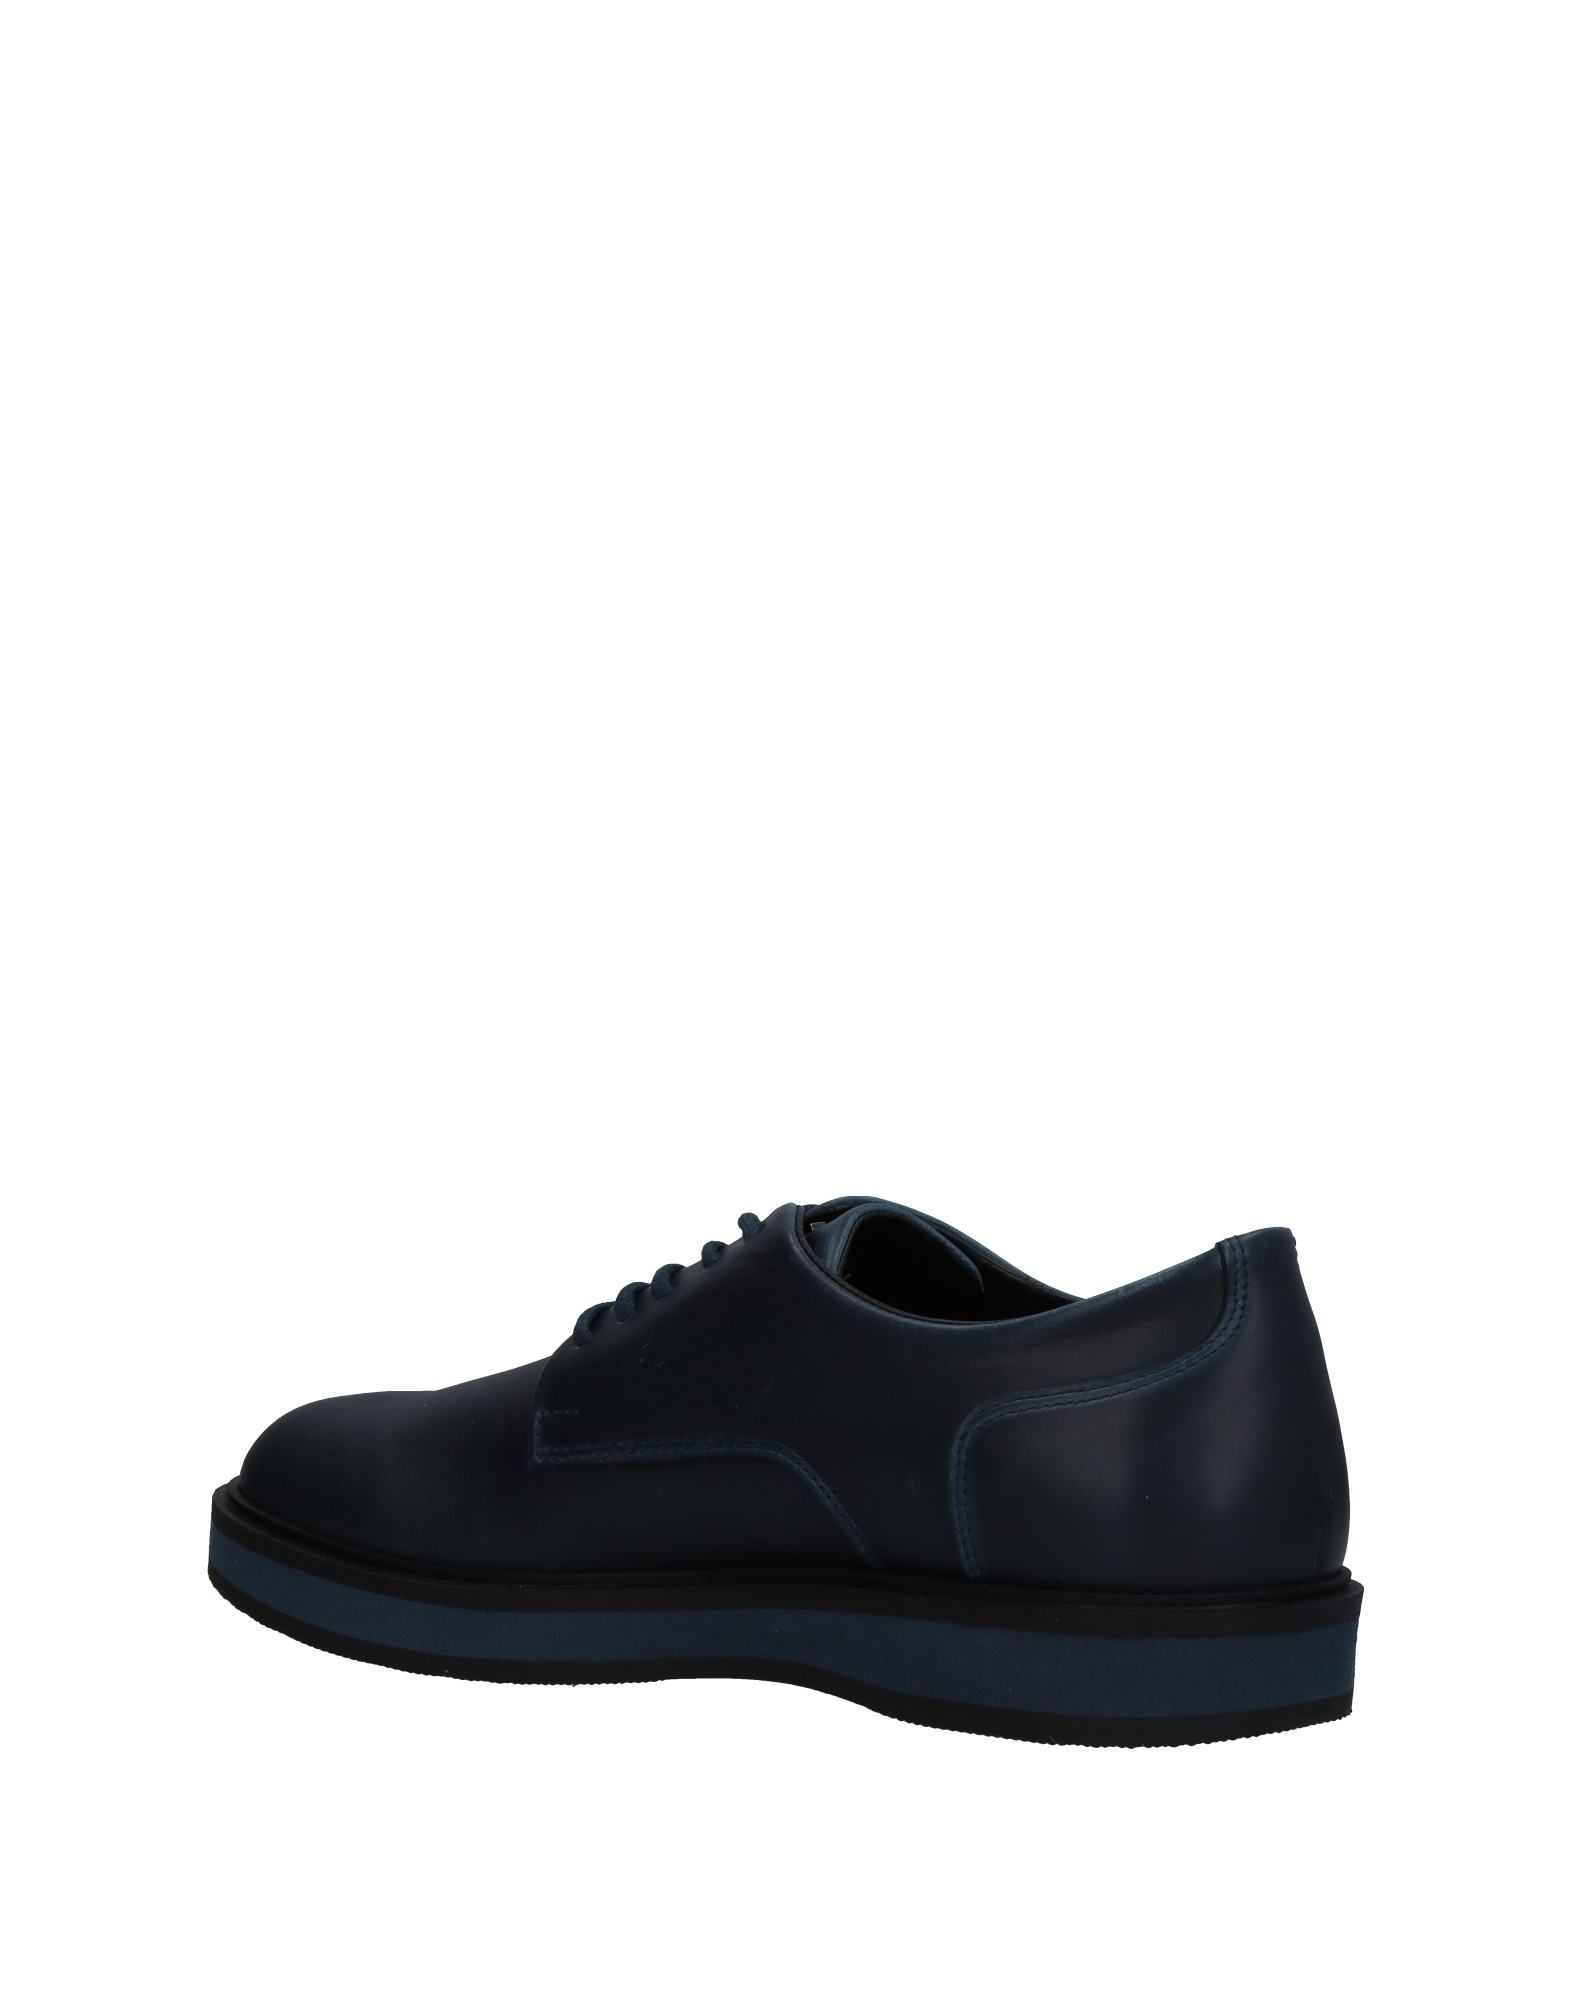 Armani Jeans Sneakers Herren Neue  11283260HP Neue Herren Schuhe 55dc82